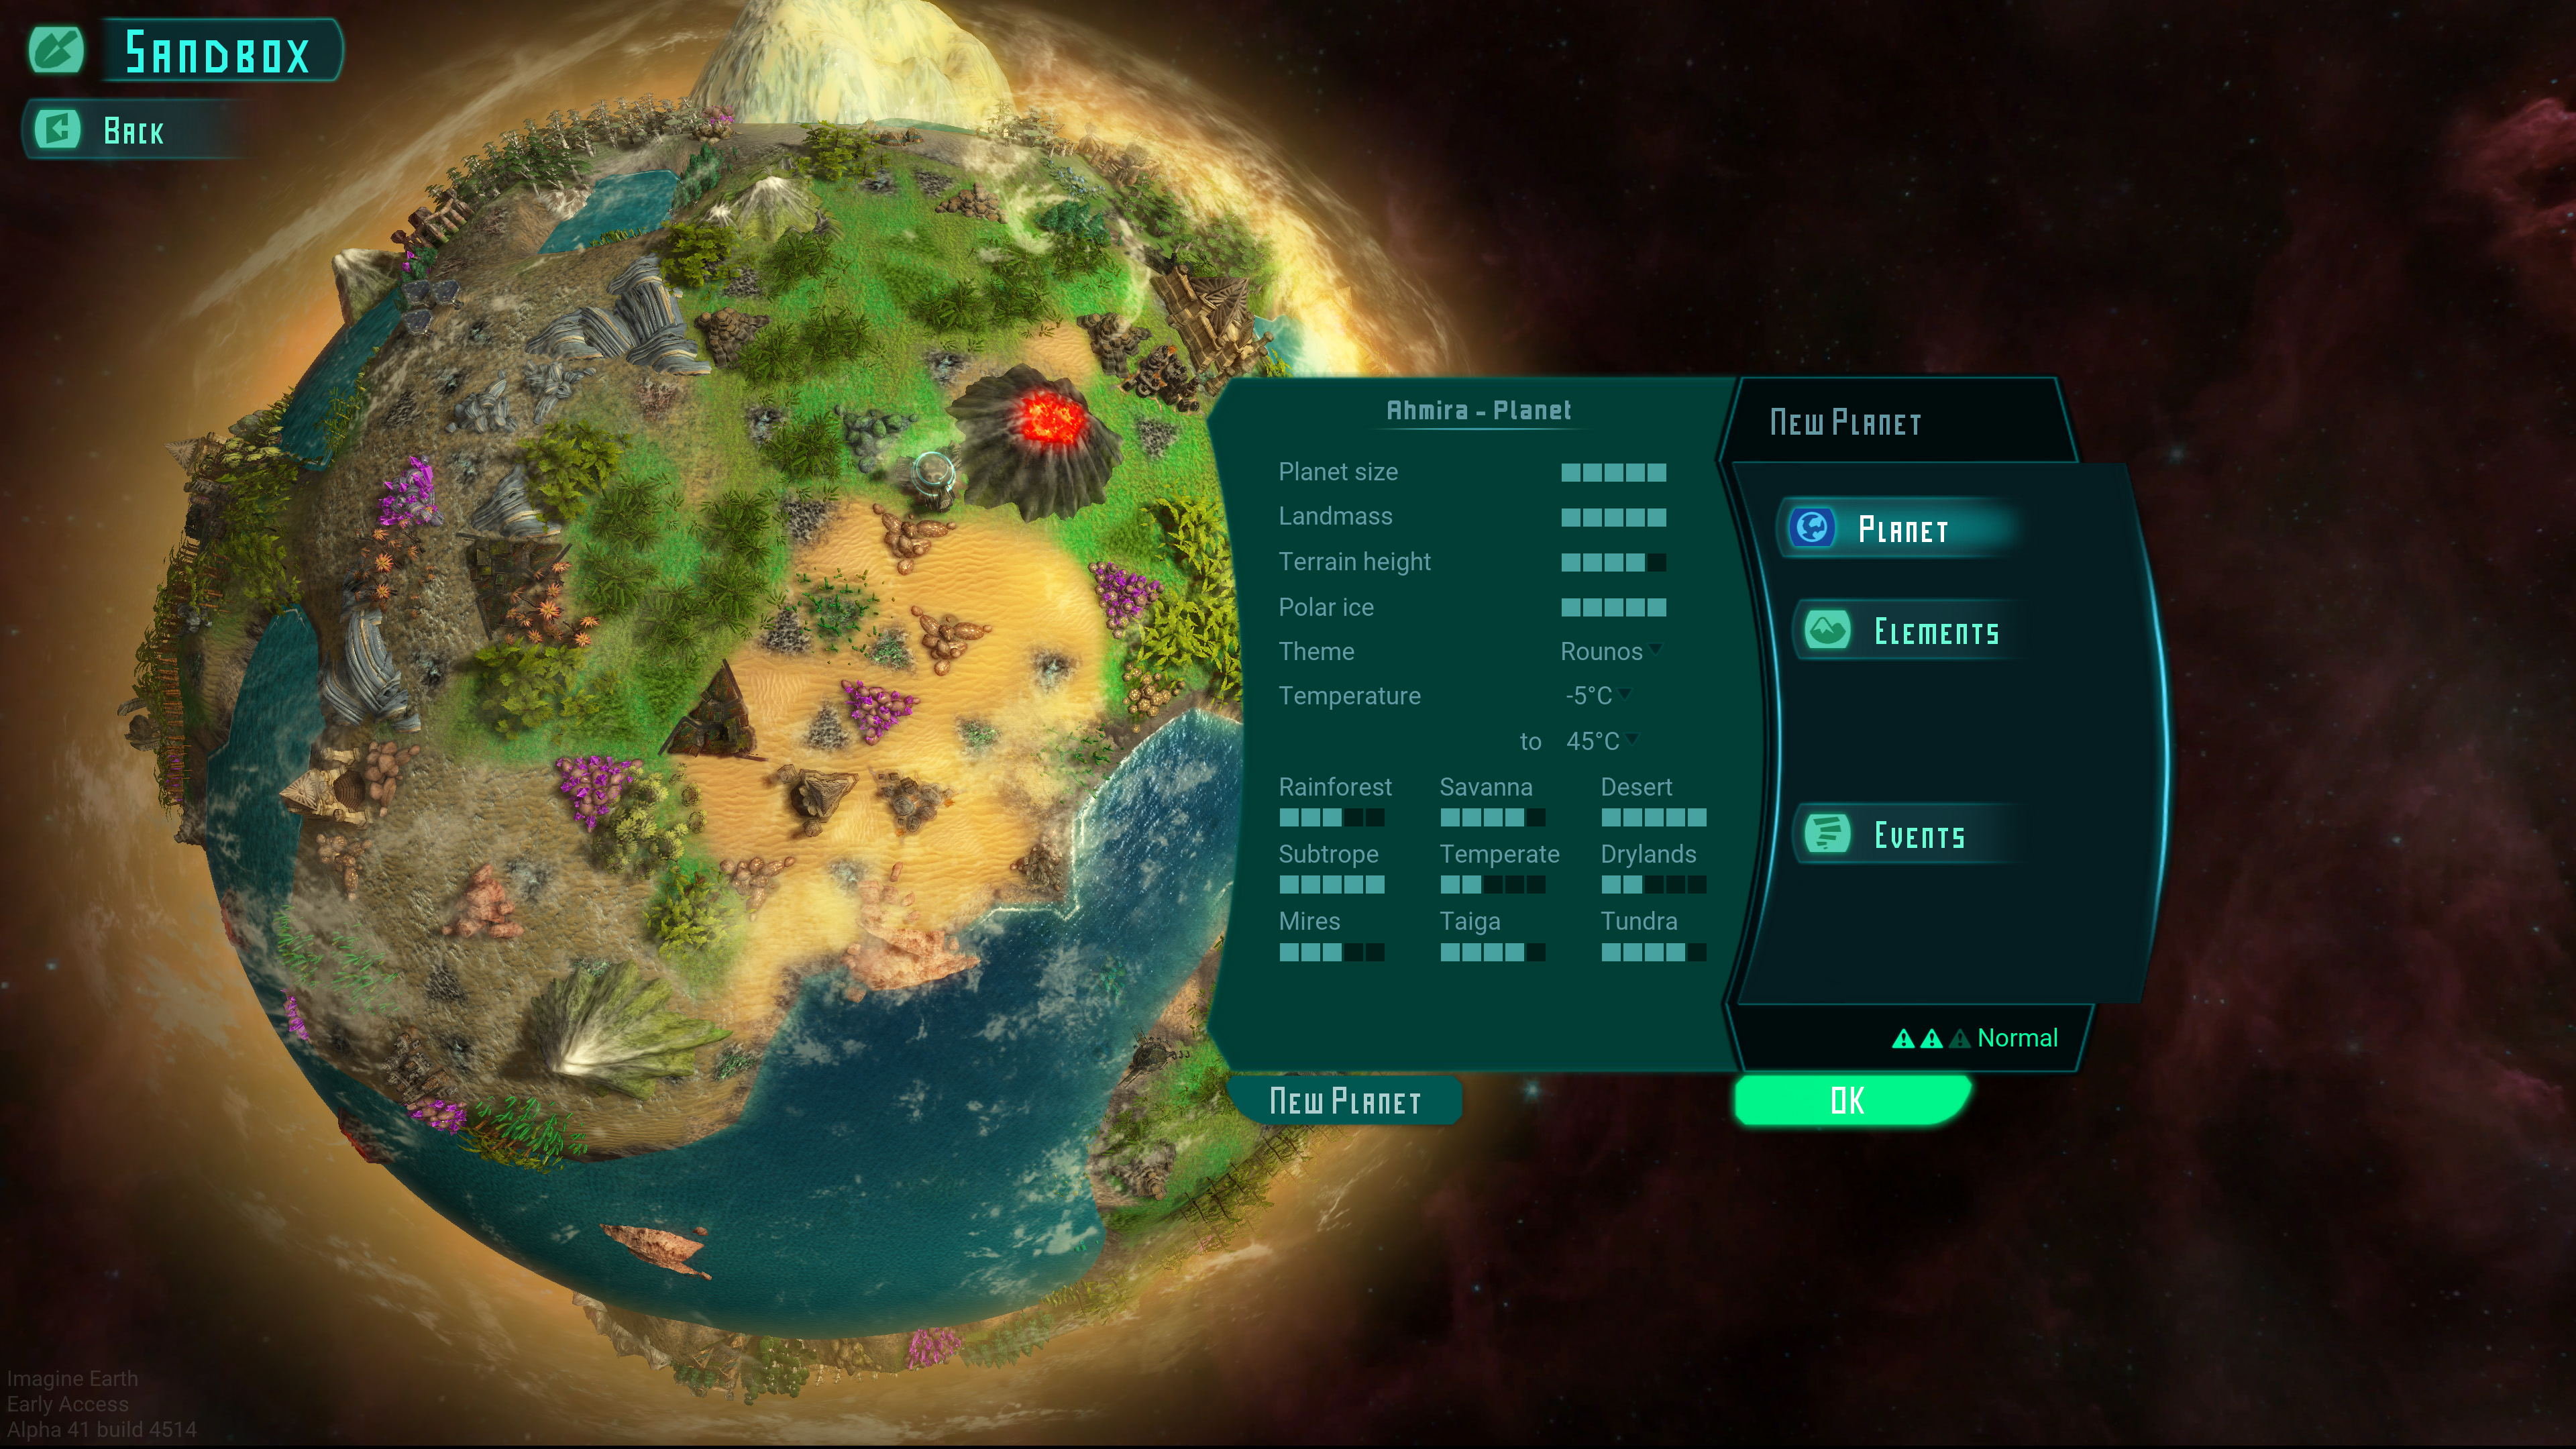 sandbox new imagine earth